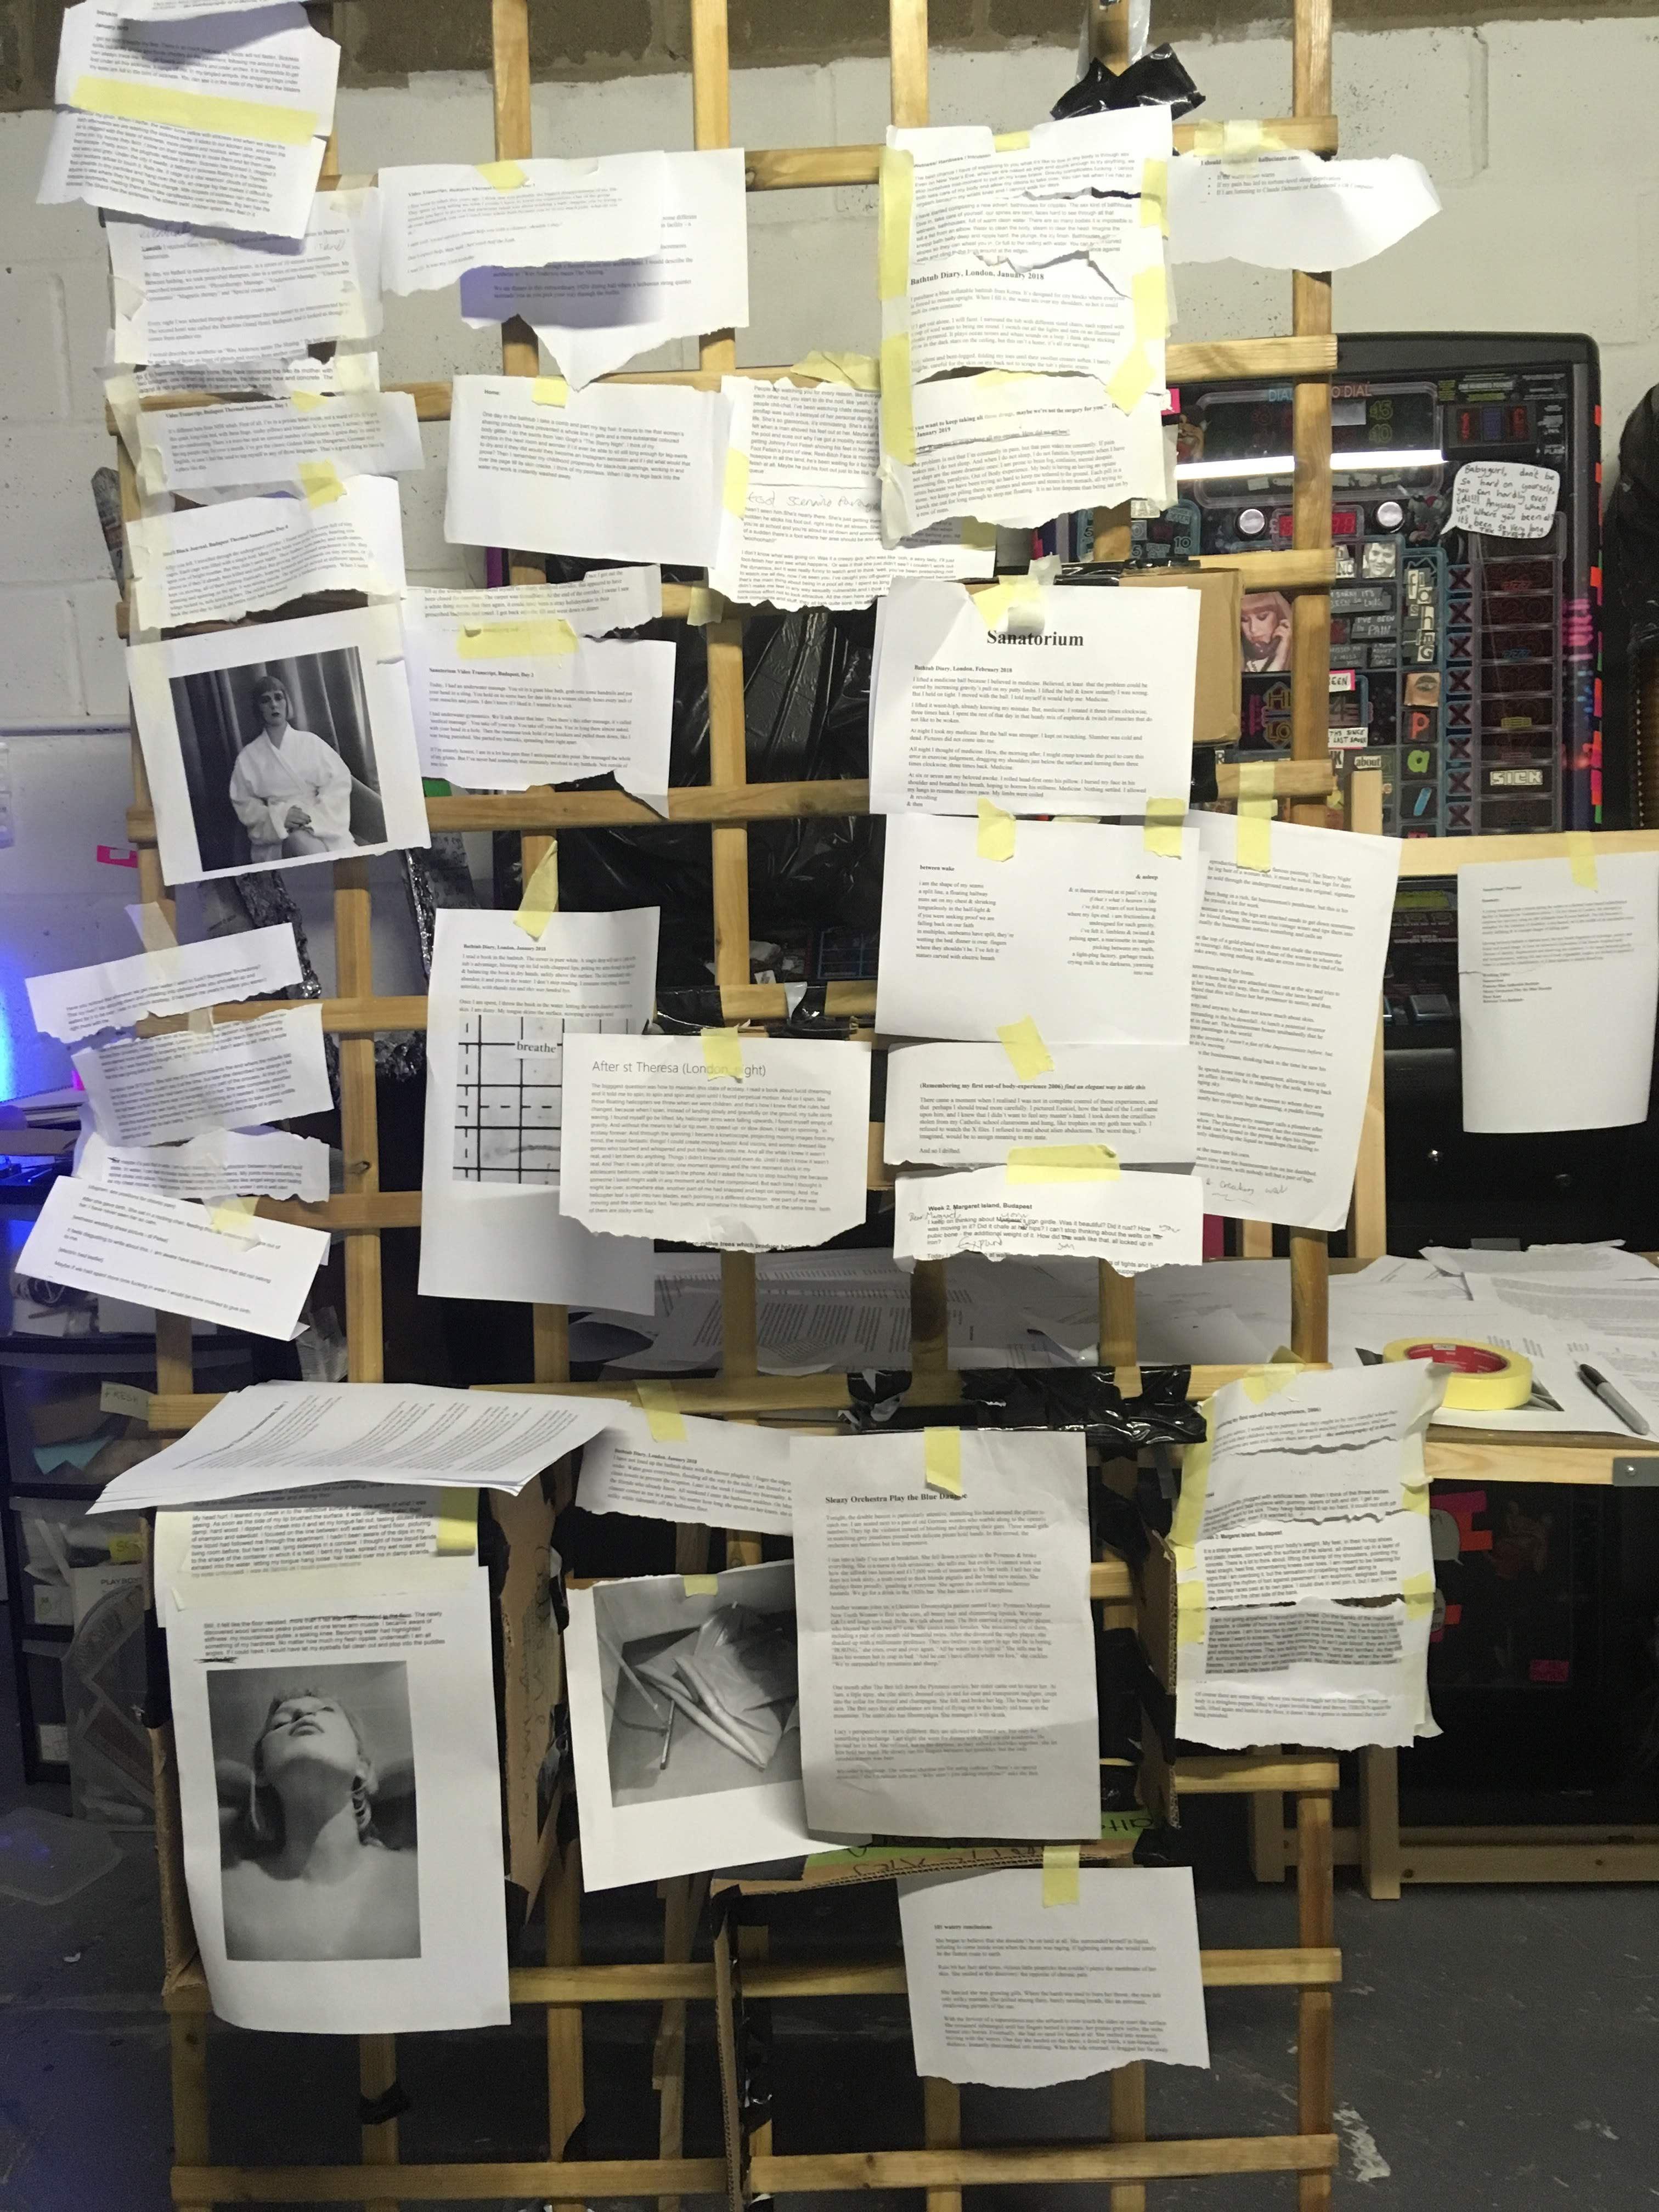 Photograph of Abi Palmer's editing process for Sanatorium